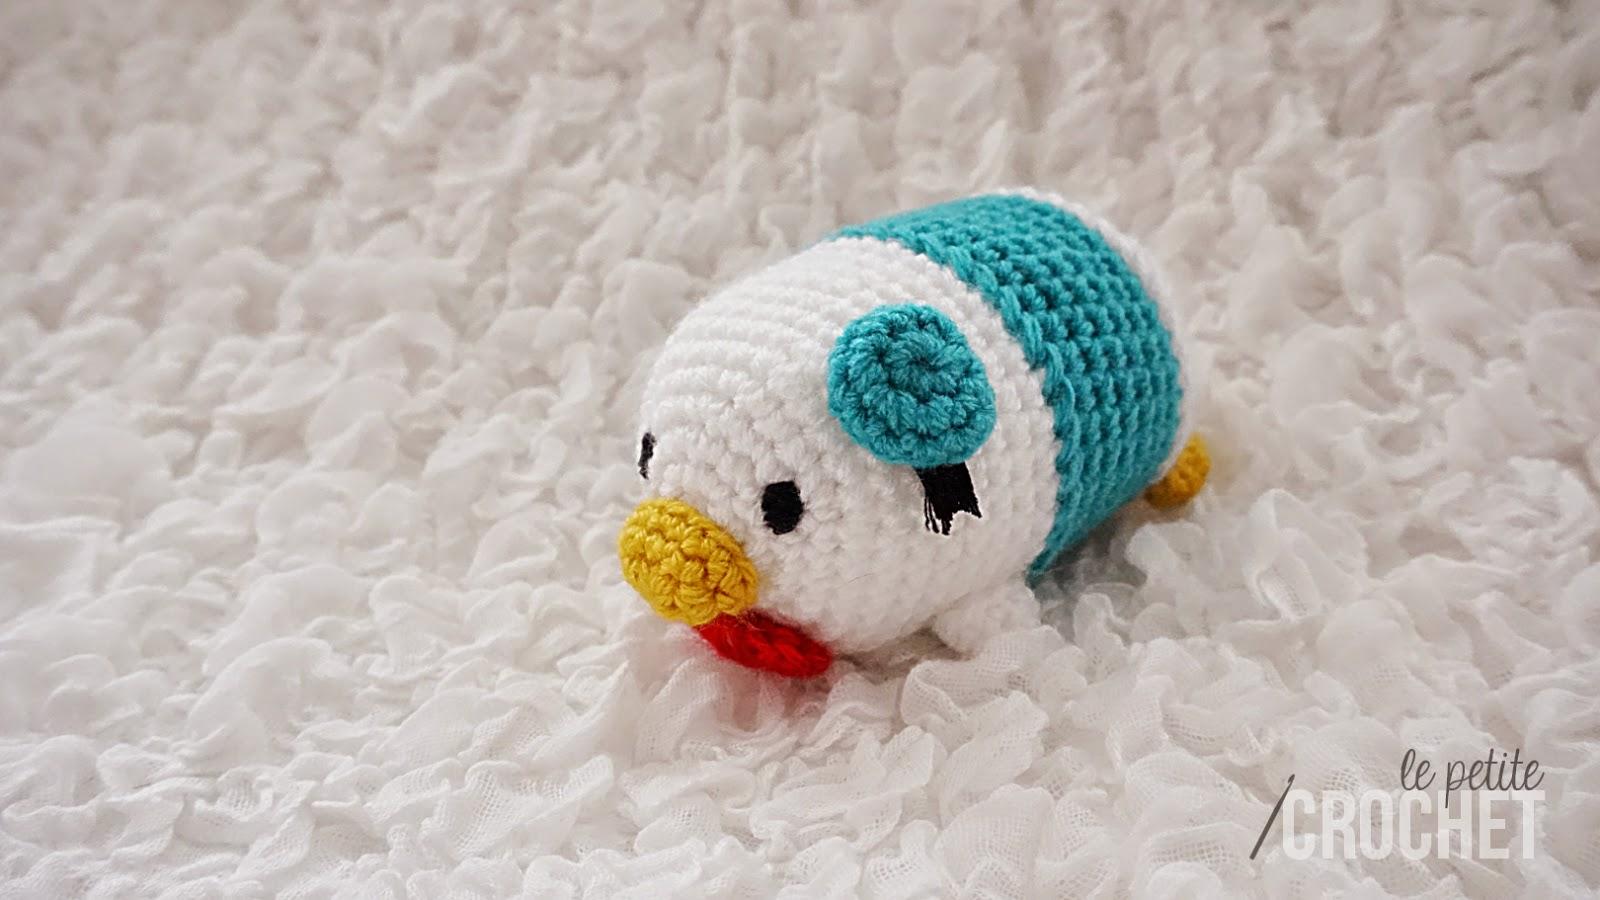 Amigurumi Tsum Tsum Free Pattern : le petite crochet: Tsum Tsum Crochet Project for 2015